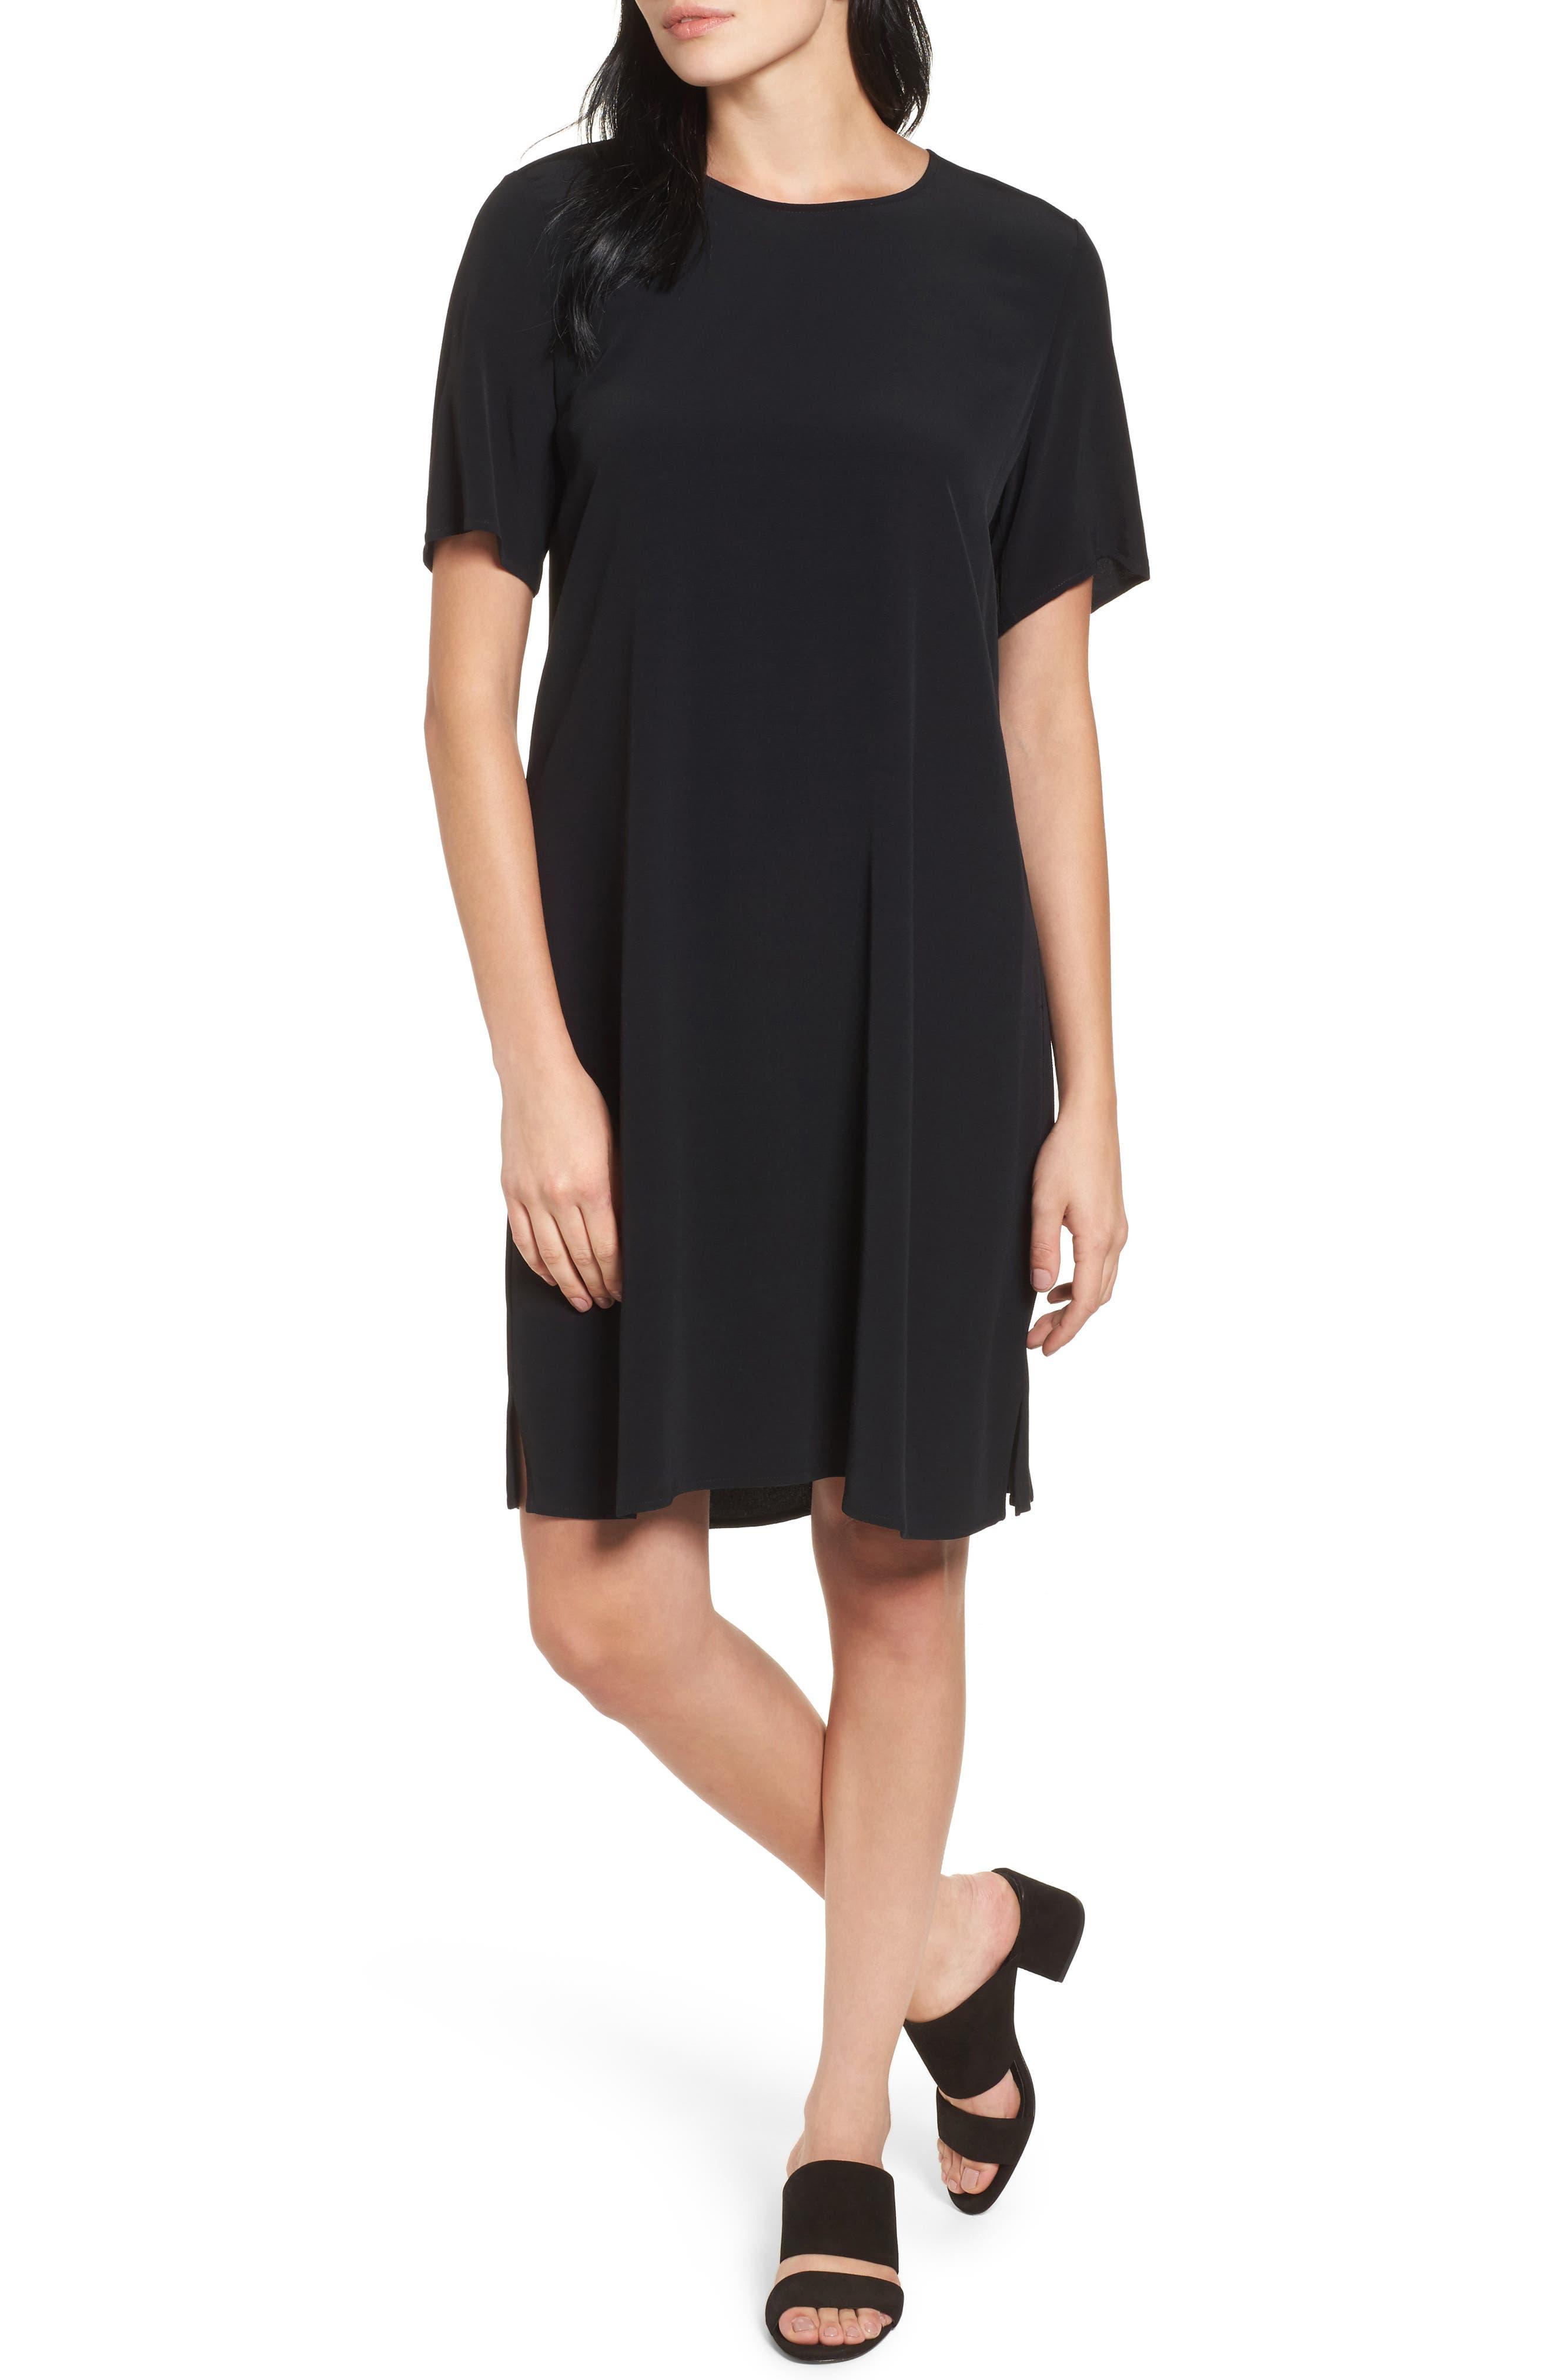 Tencel<sup>®</sup> Lyocell Blend Jersey Shift Dress,                         Main,                         color, Black